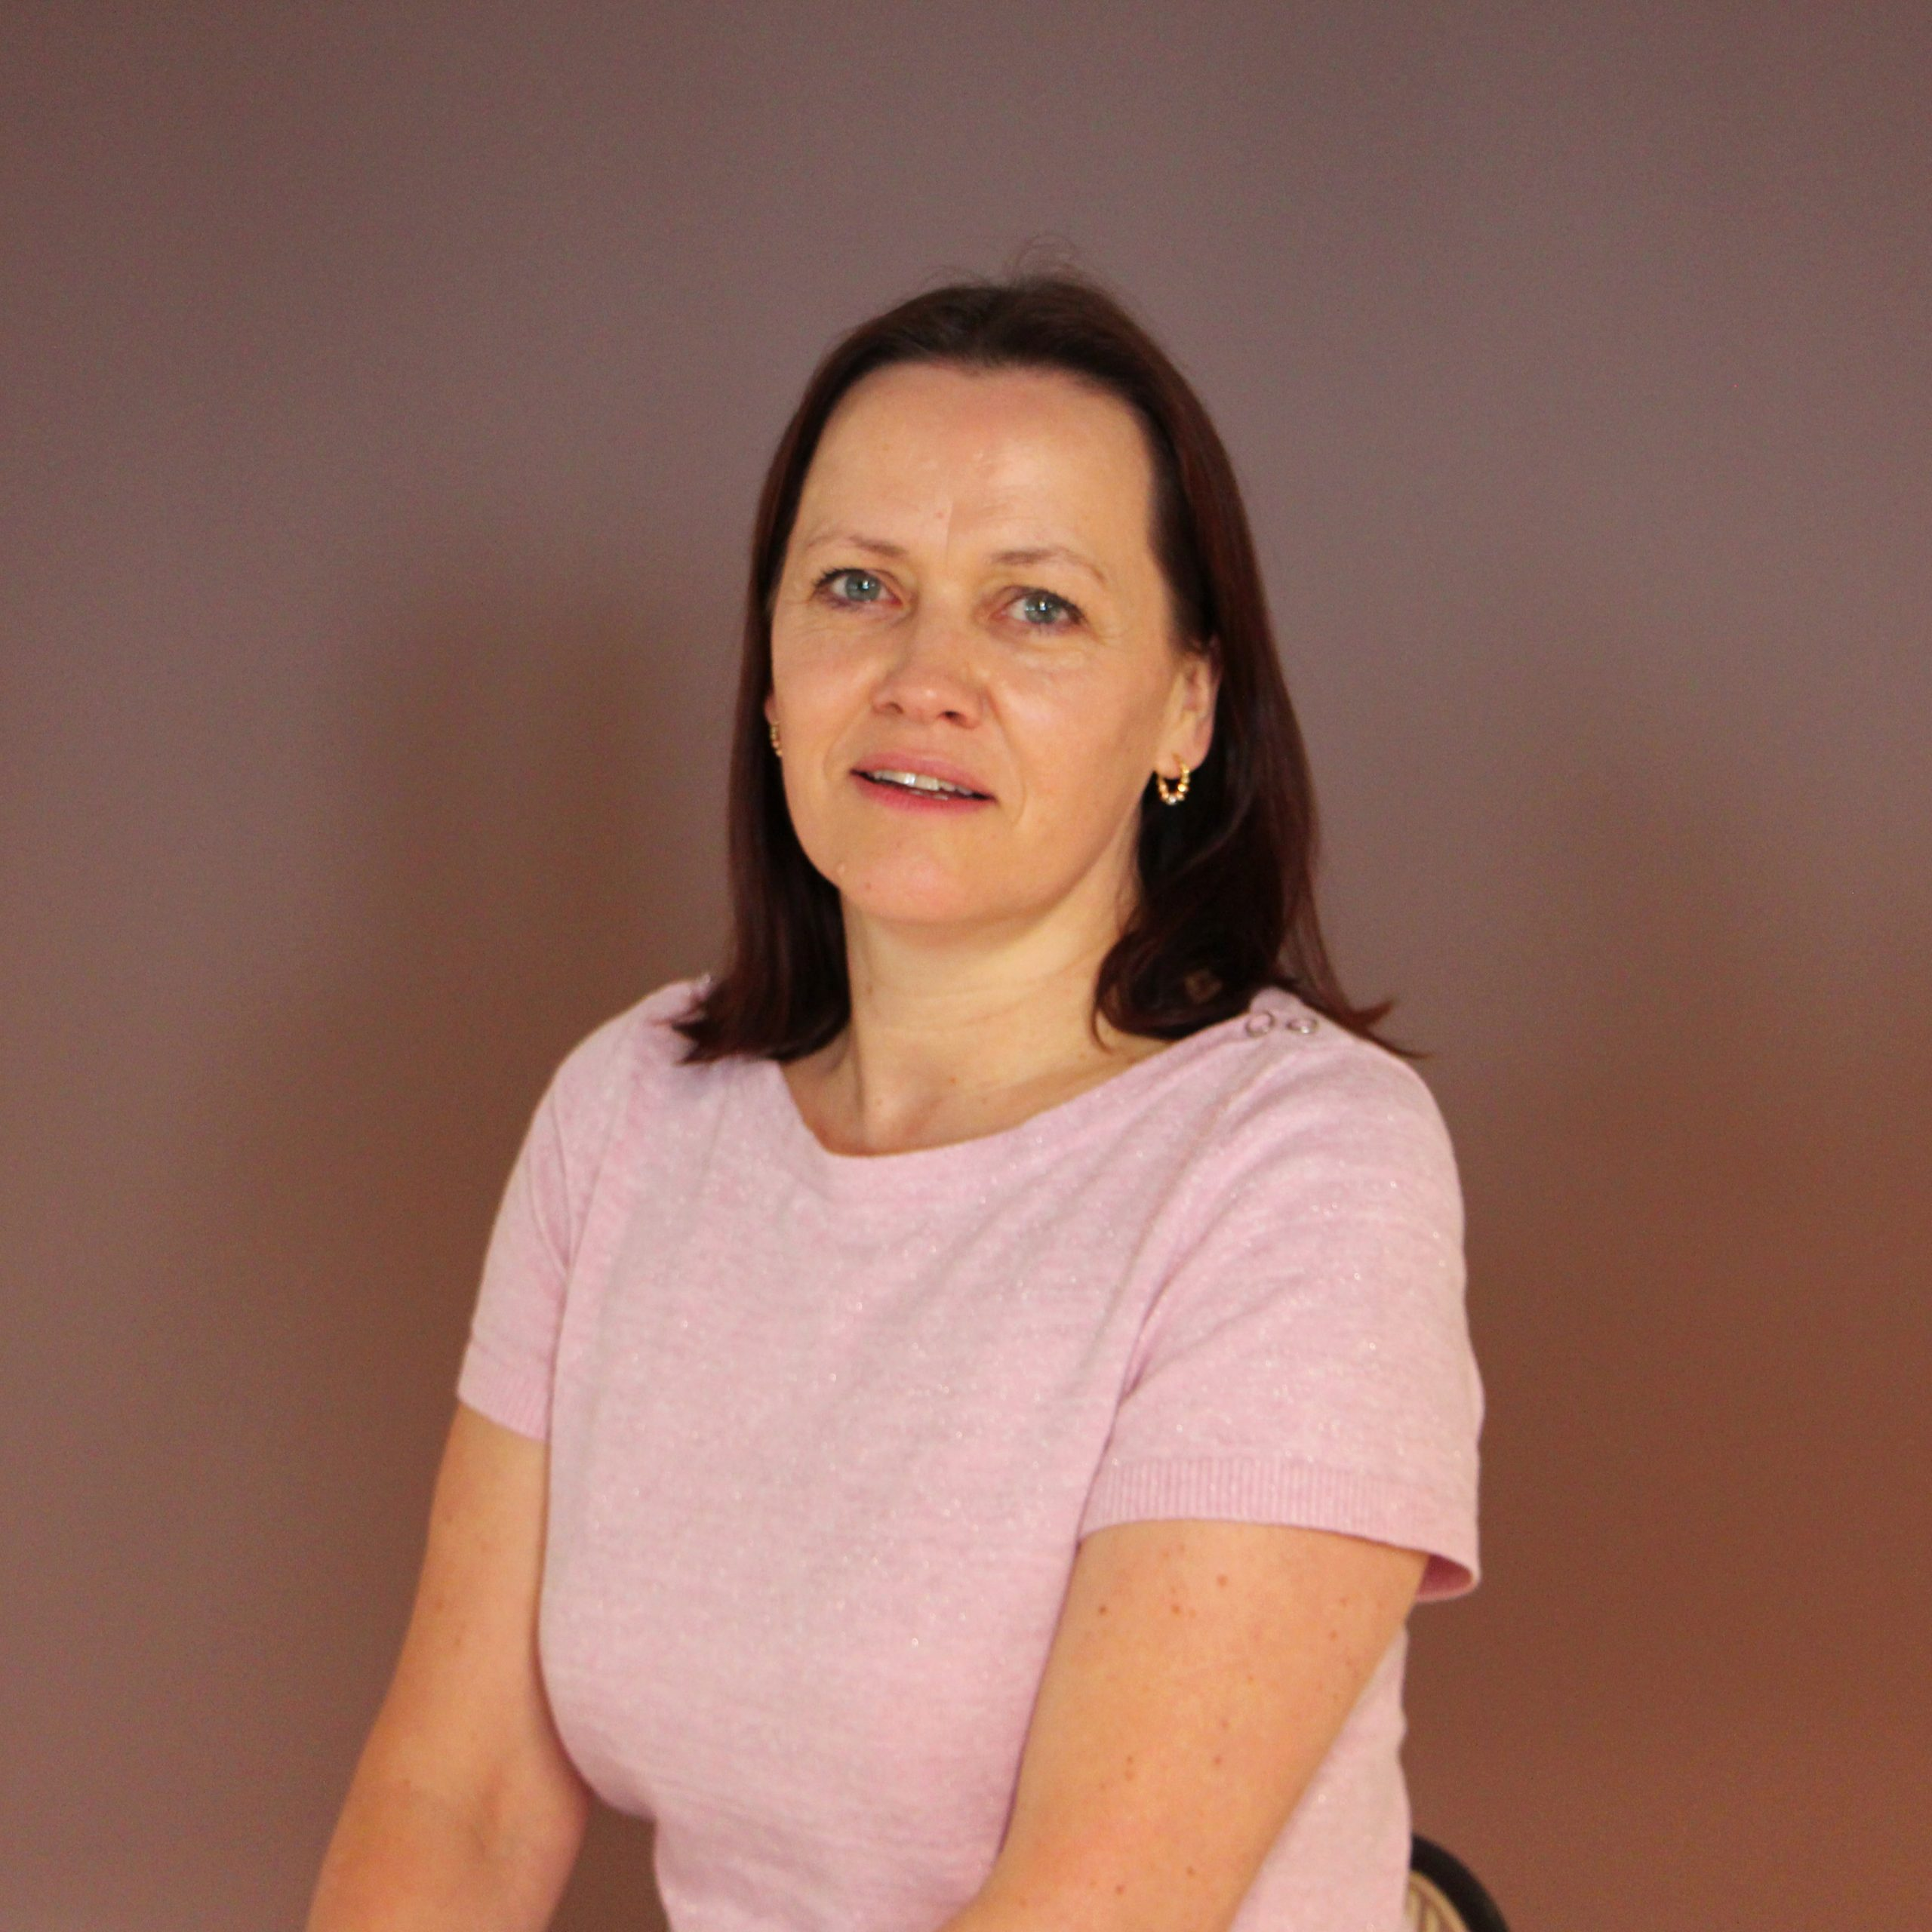 Danielle Herbert